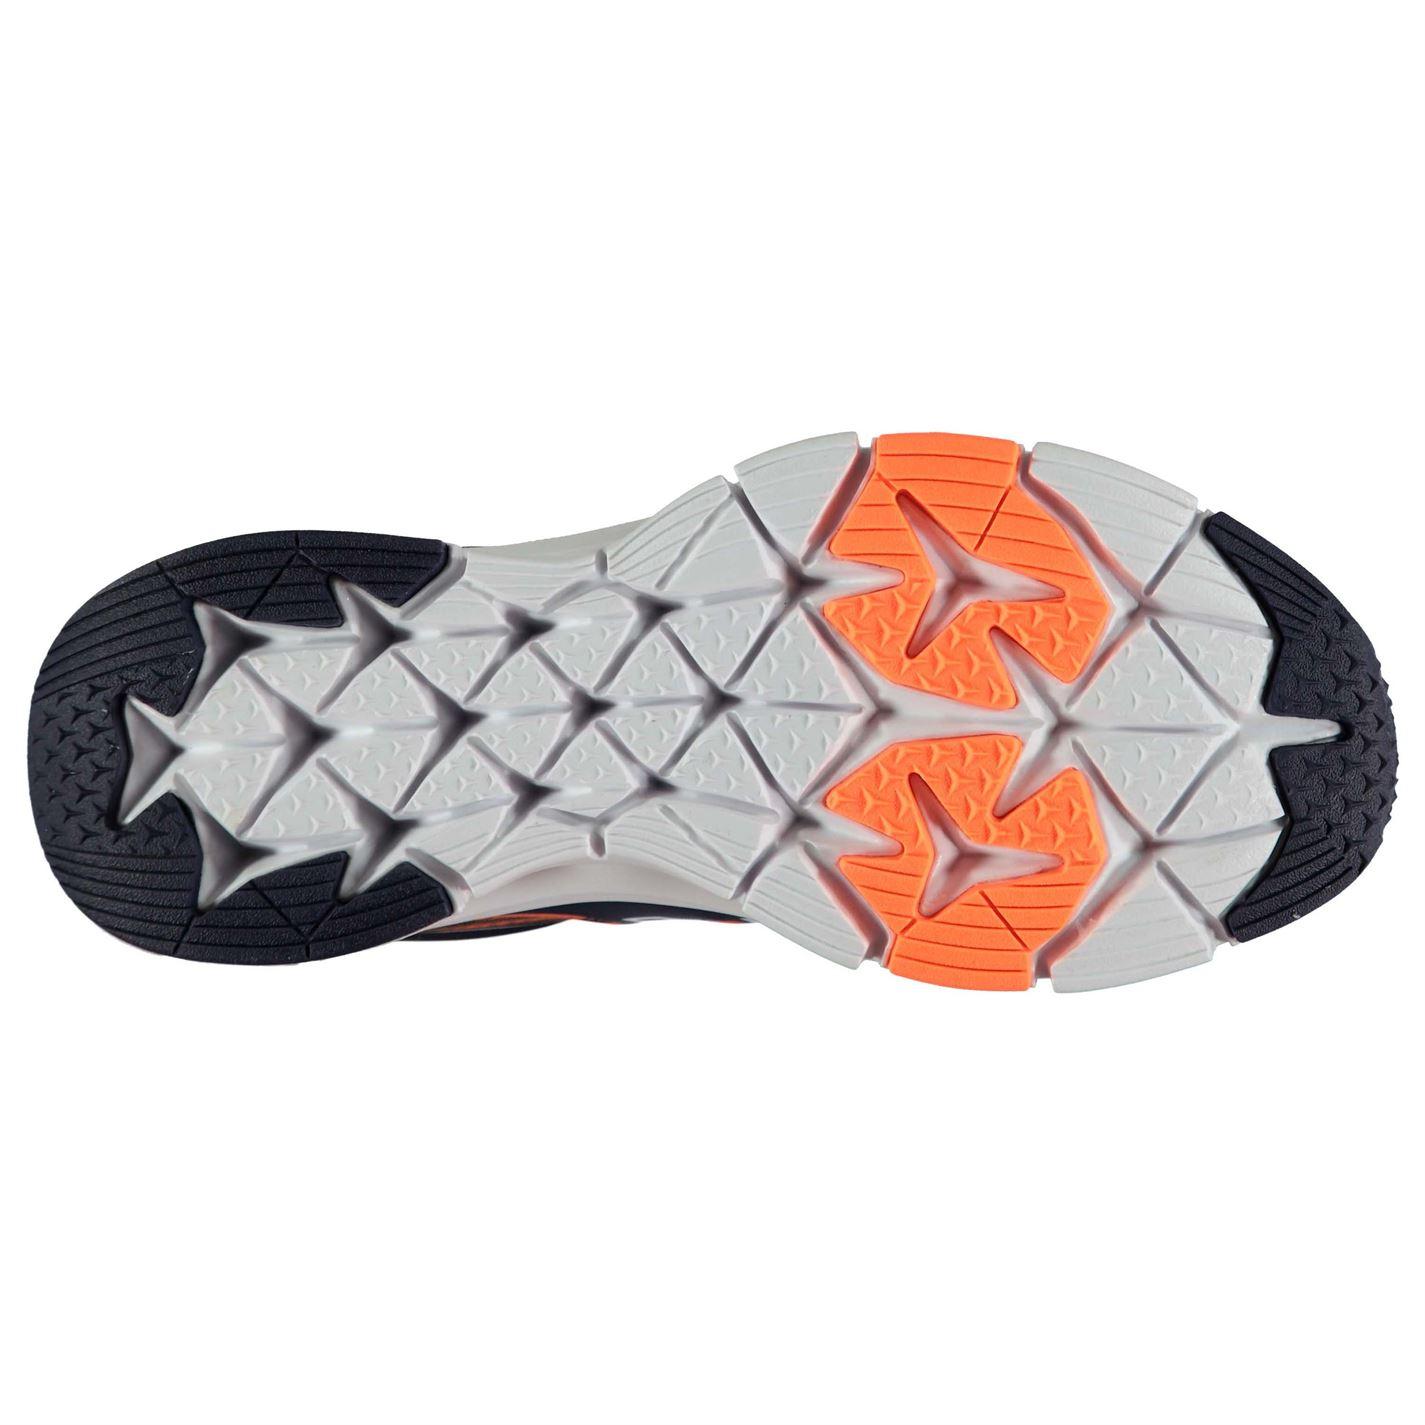 Tenis-New-Balance-RIFM-v1-para-hombre-Caballeros-De-Carretera-Zapatillas-Cordones-atados miniatura 5